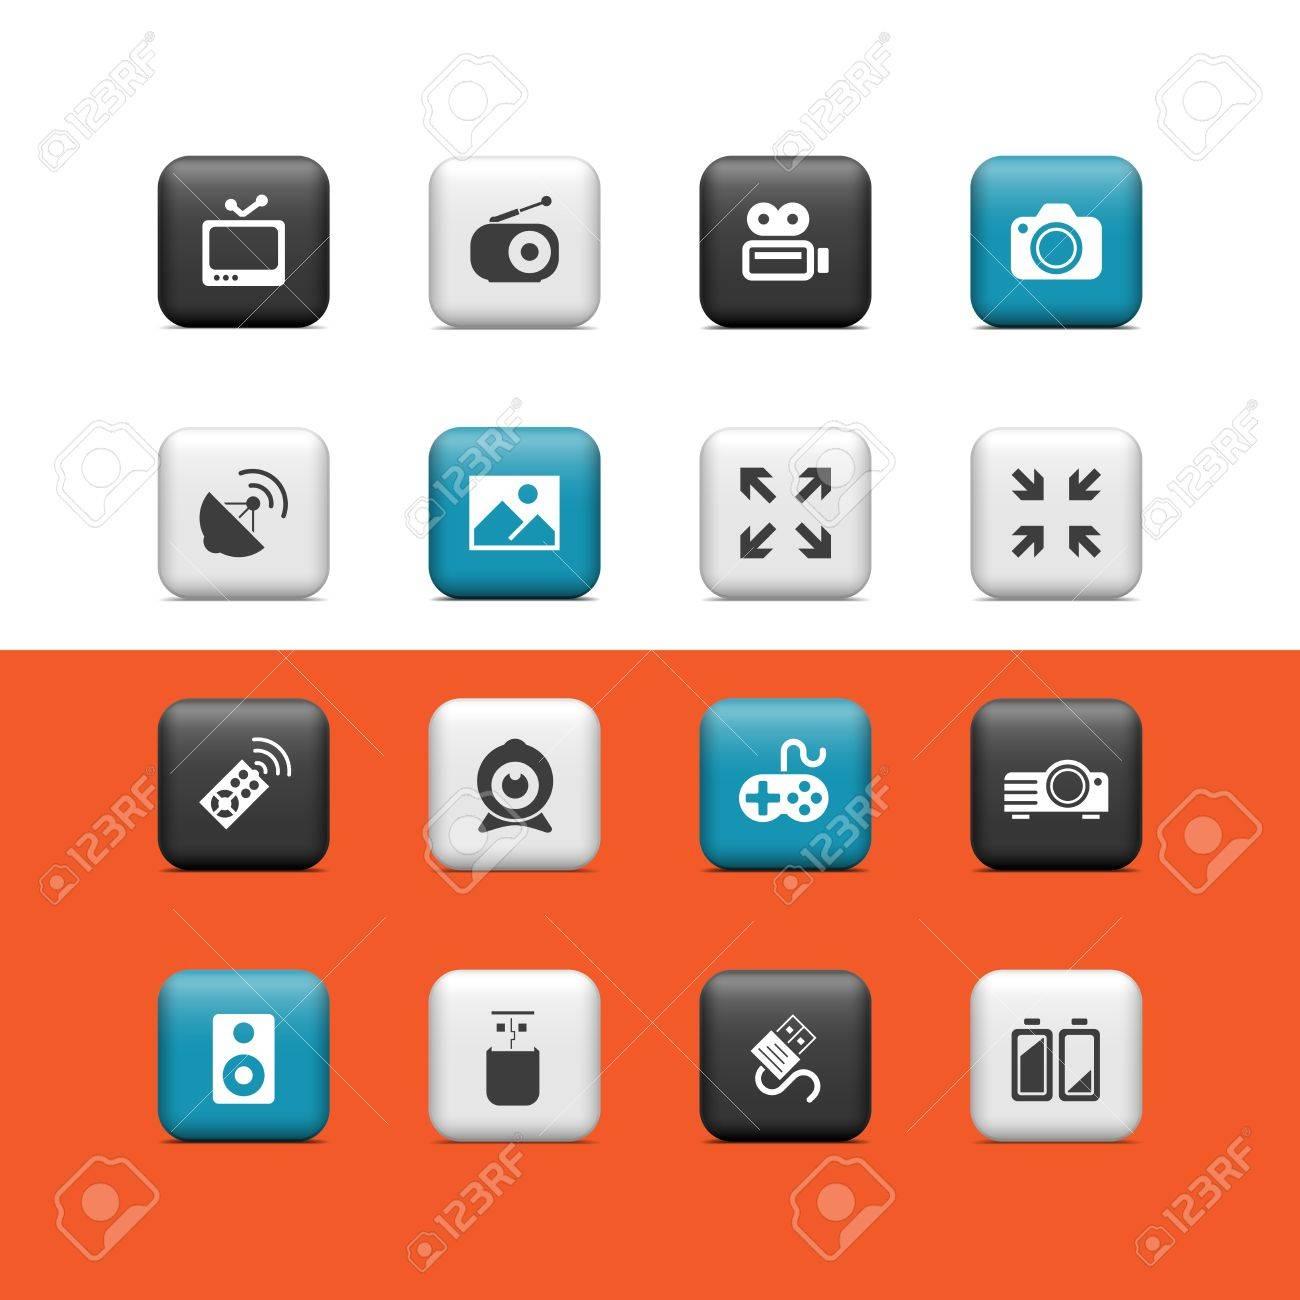 Multimedia buttons Stock Vector - 15445656